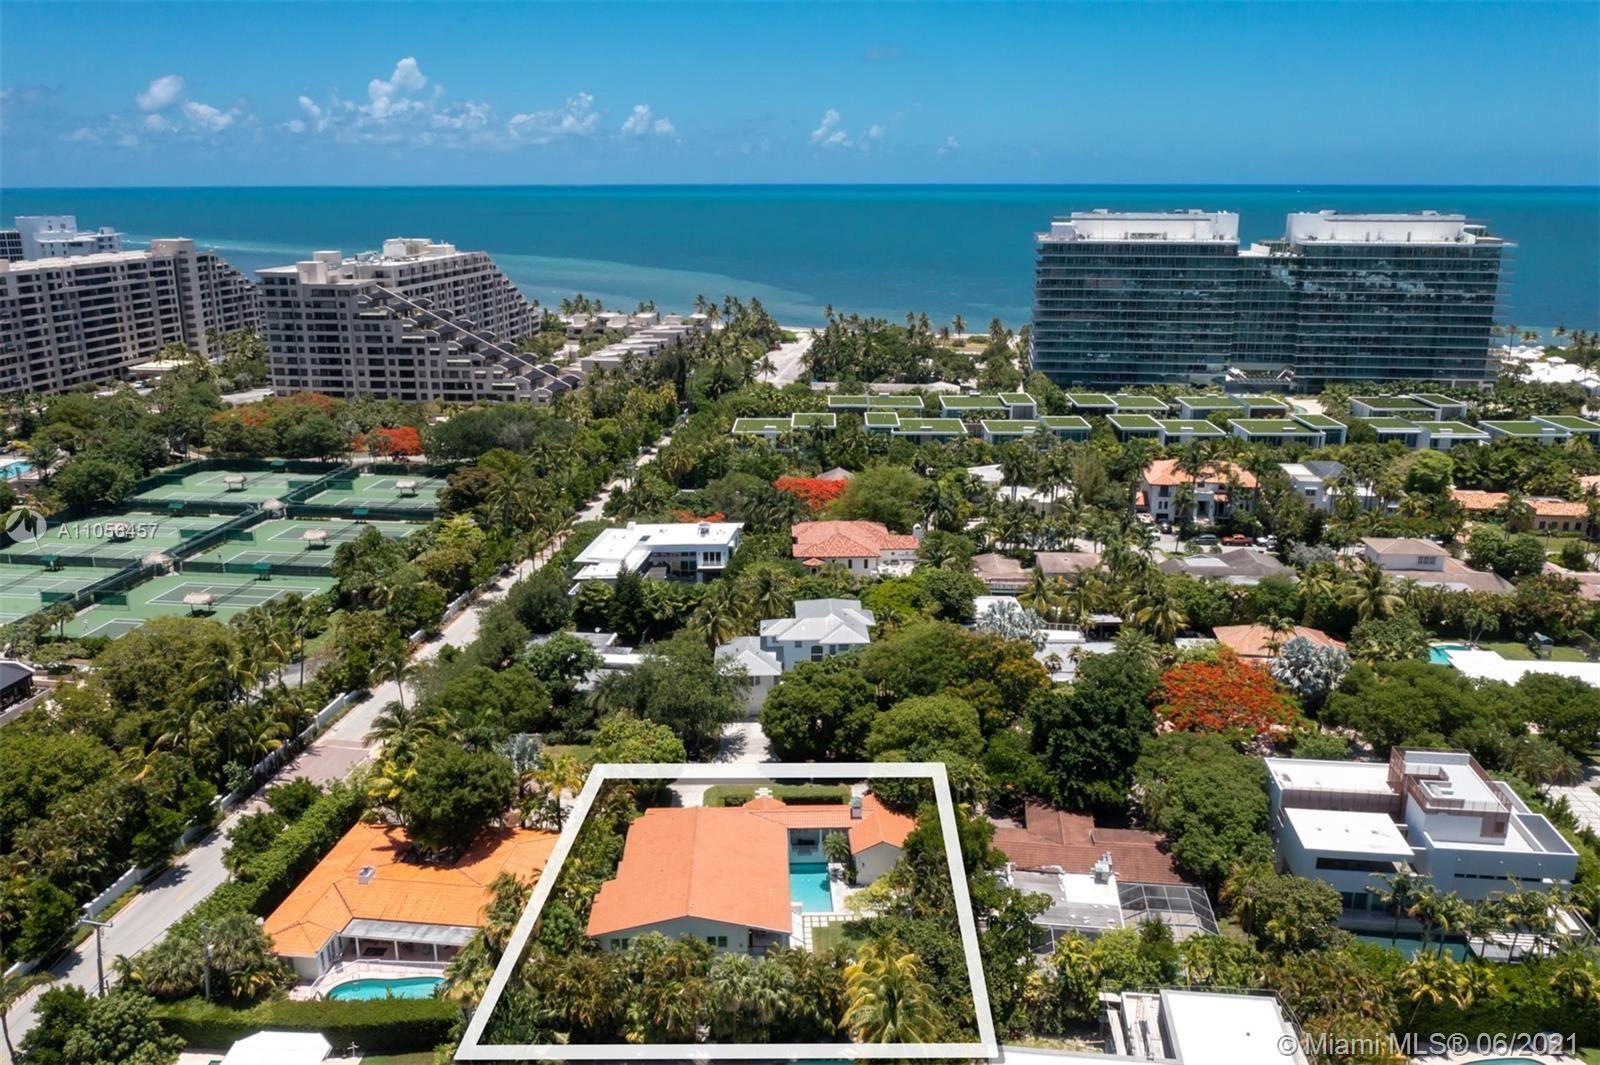 320 Pacific Rd, Key Biscayne, FL 33149 - #: A11056457